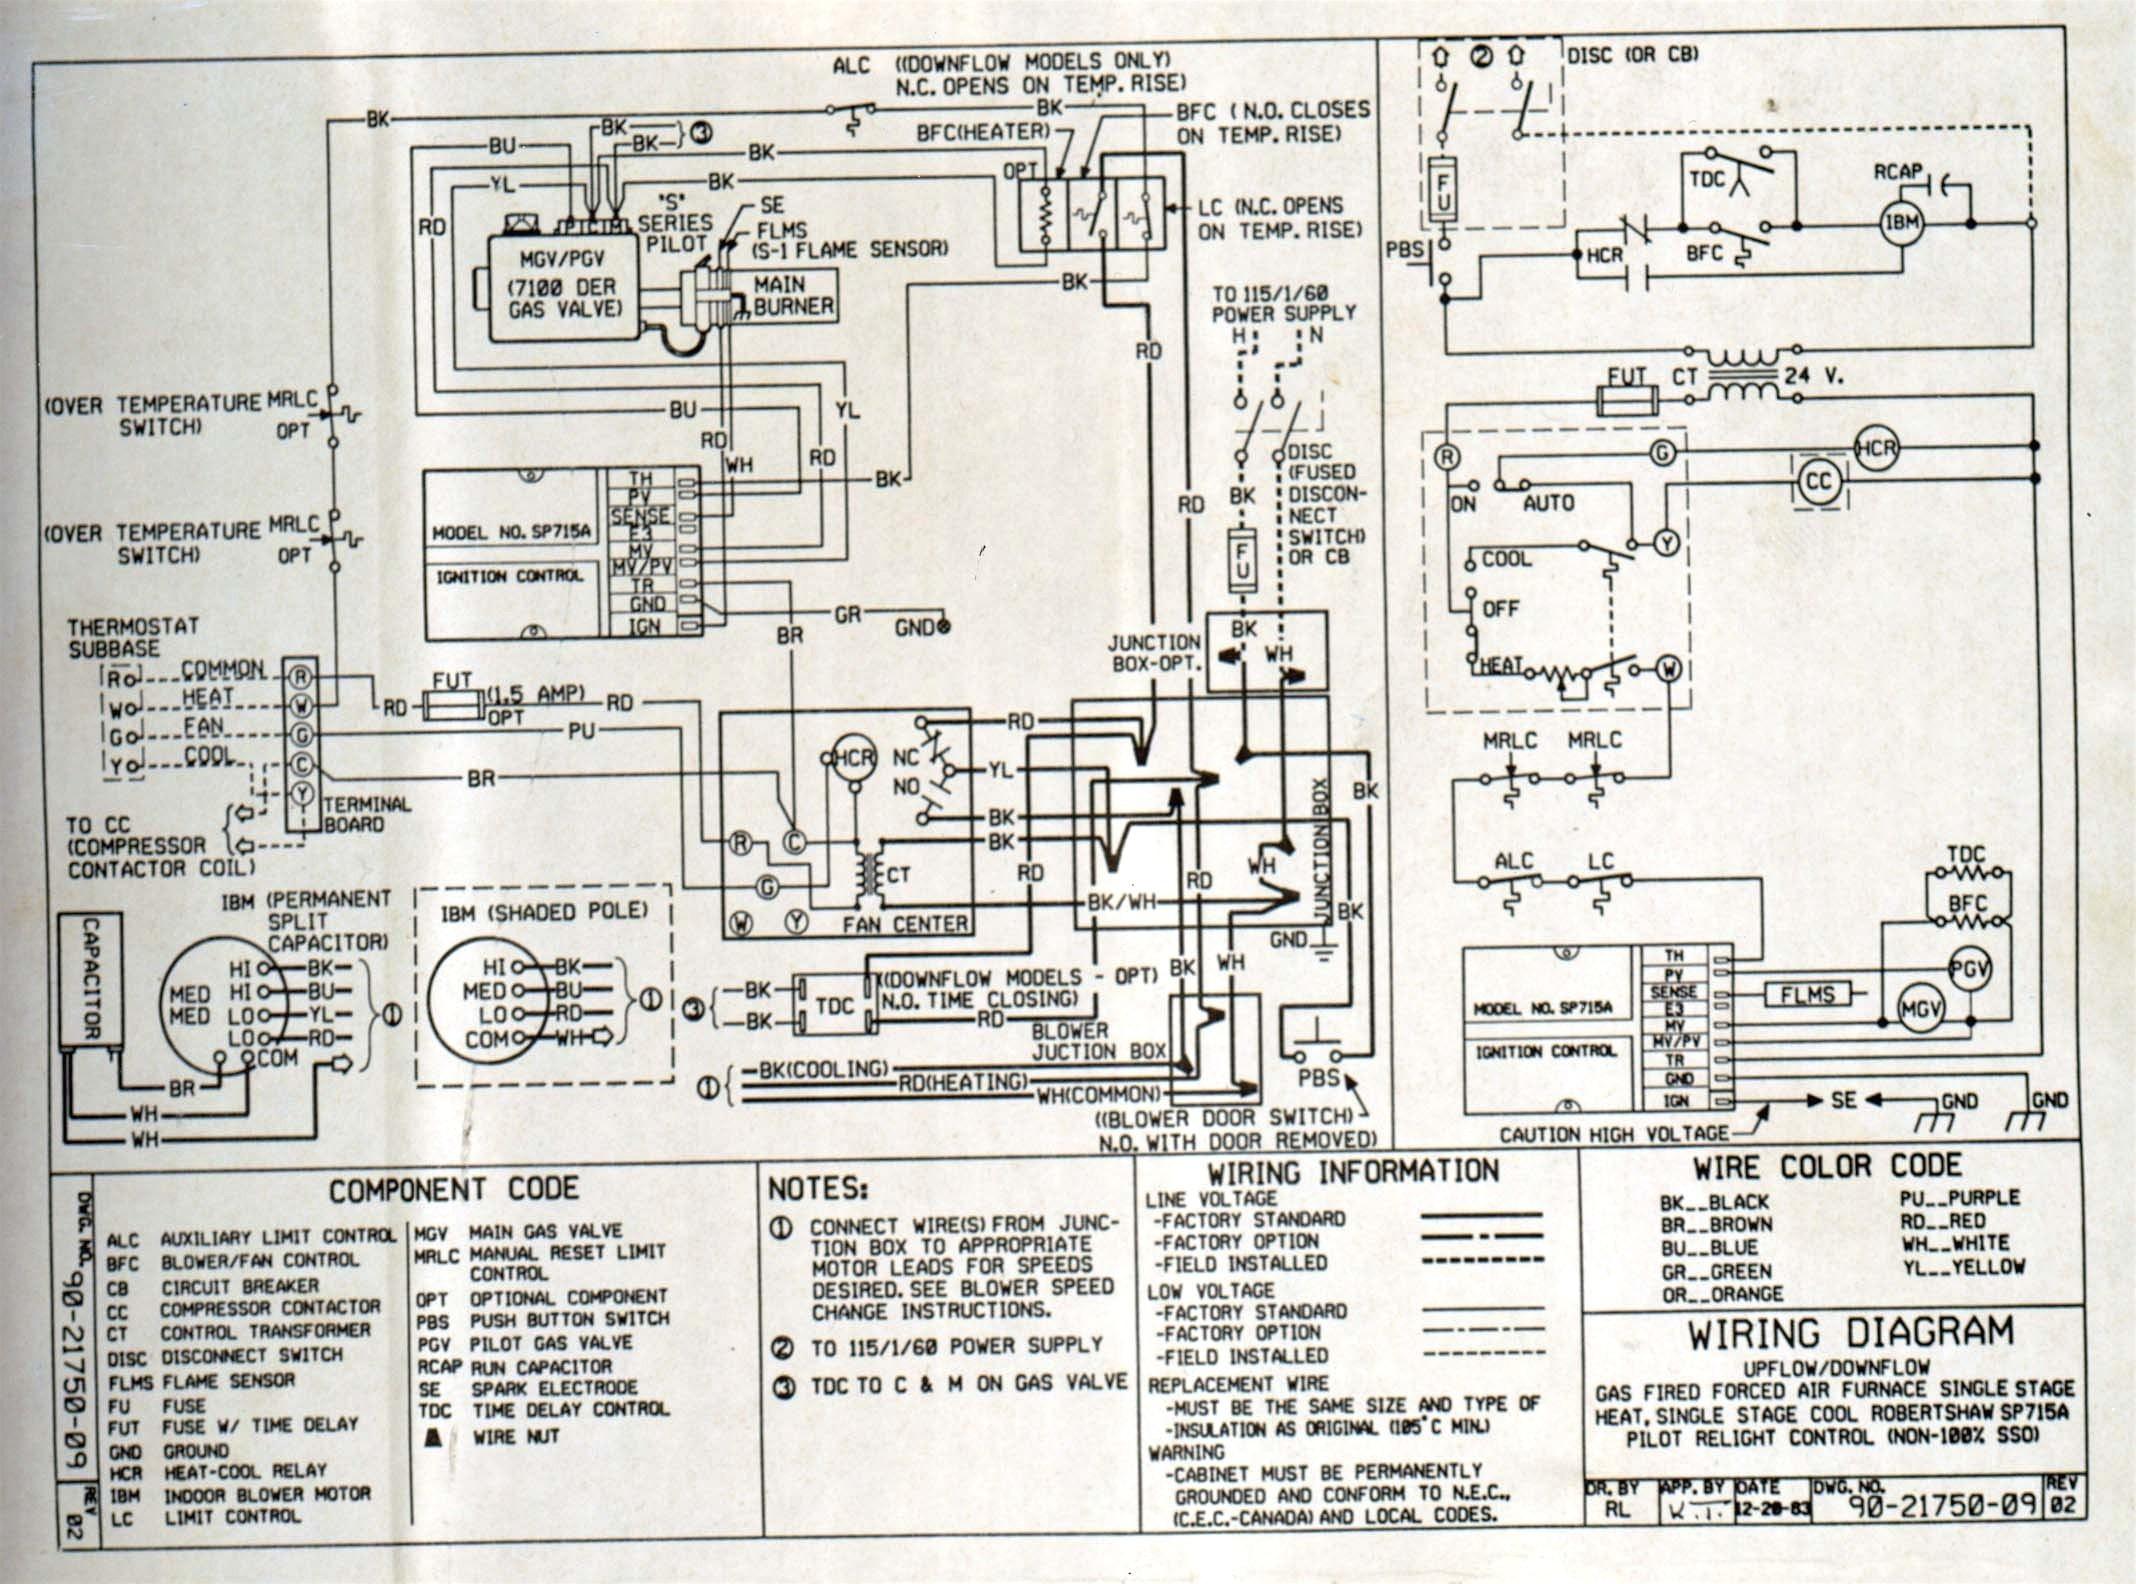 Wiring Diagram for Maytag Dryer Wiring Diagram Maytag Dryer New Recent Wiring Diagram for Ge Dryer Of Wiring Diagram for Maytag Dryer